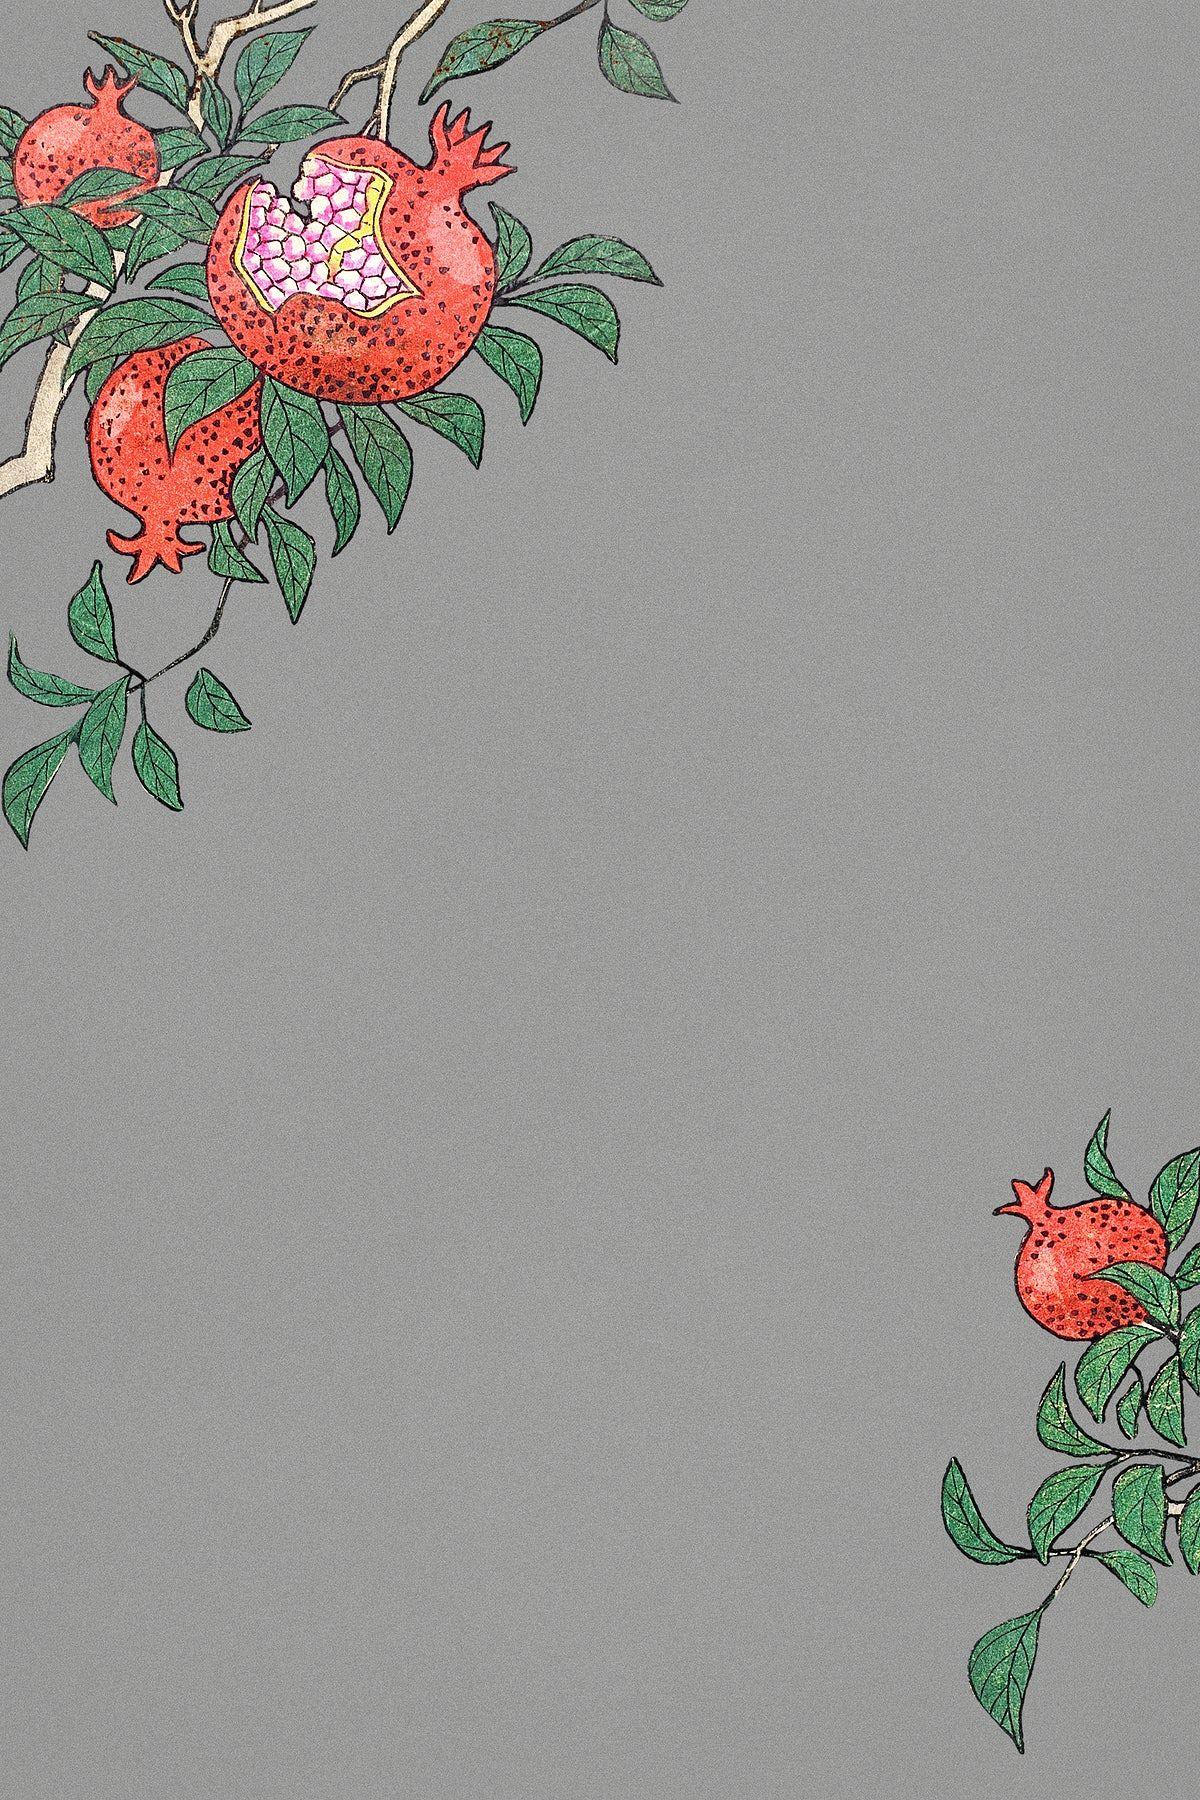 Pomegranate border frame design element | free image by ...